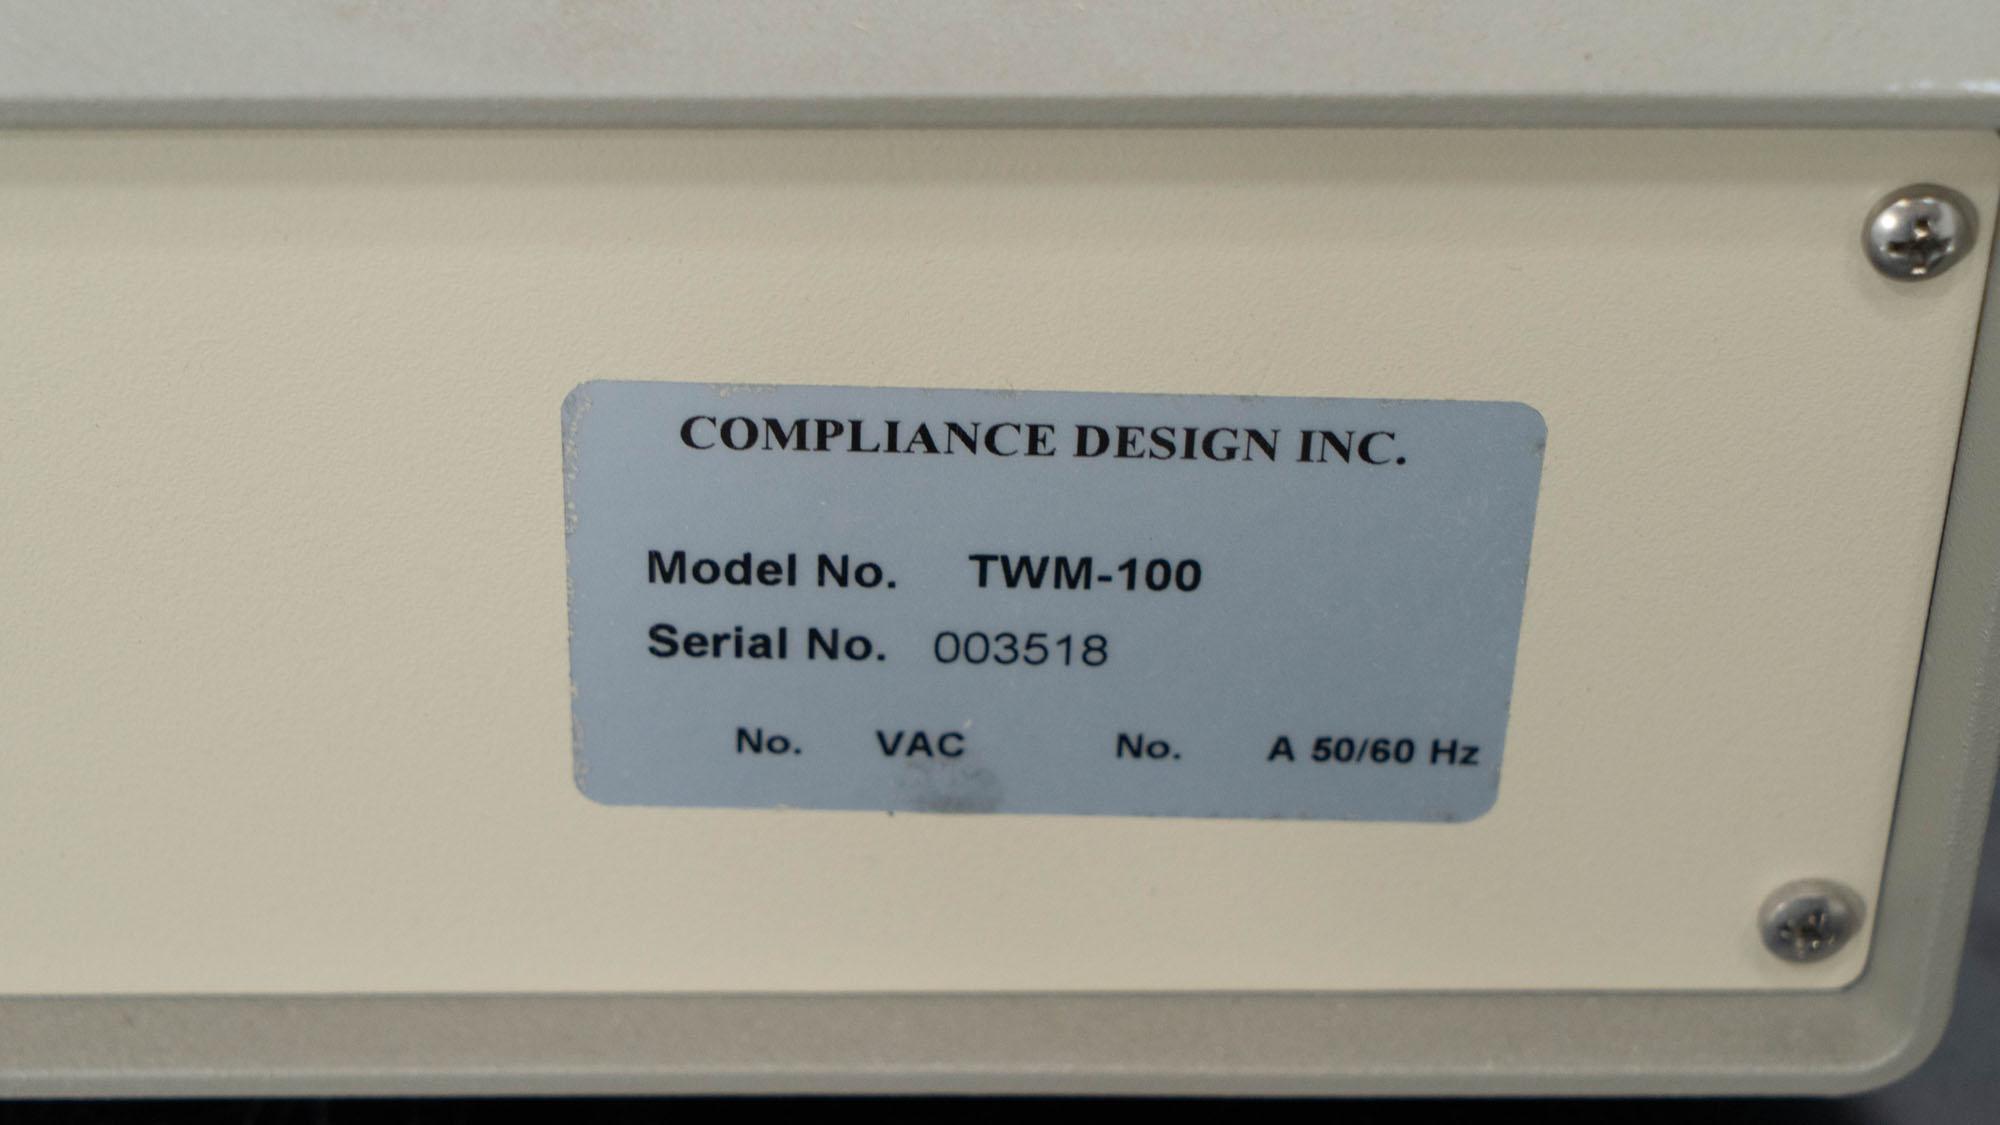 Compliance Design Transient Waveform Monitor, Model TWM-100